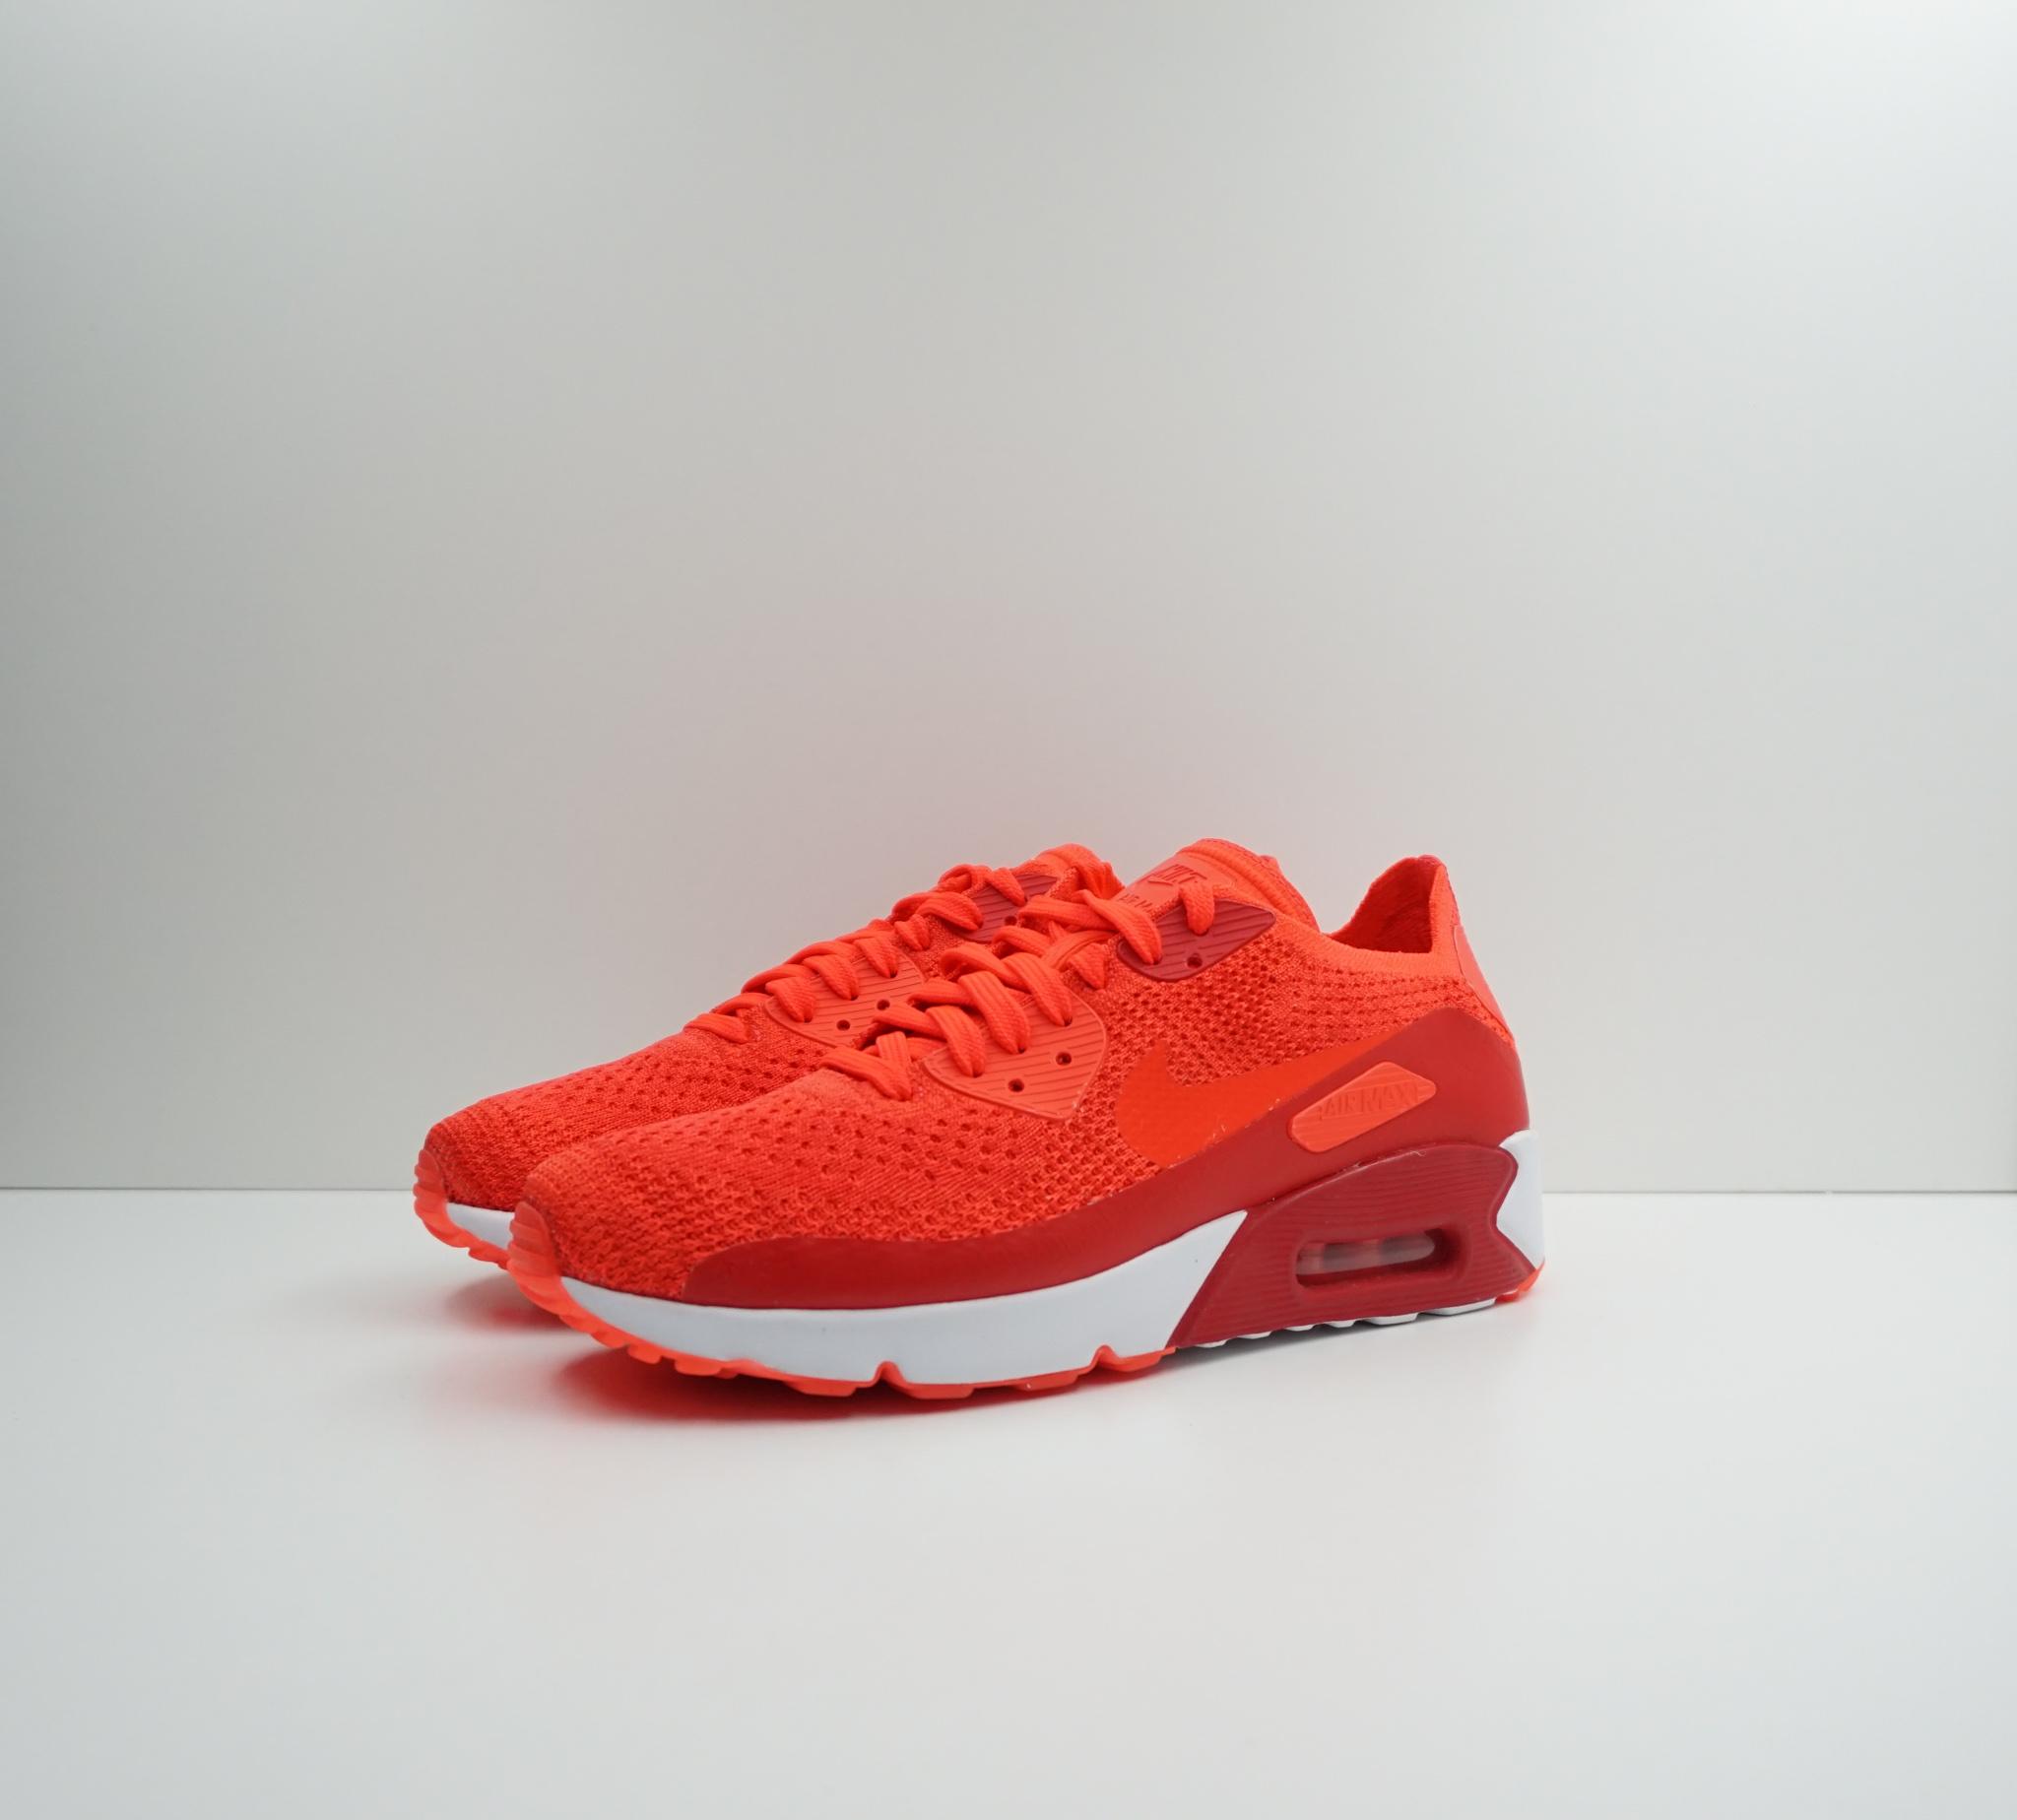 Nike Air Max 90 Ultra 2.0 Flyknit Bright Crimson